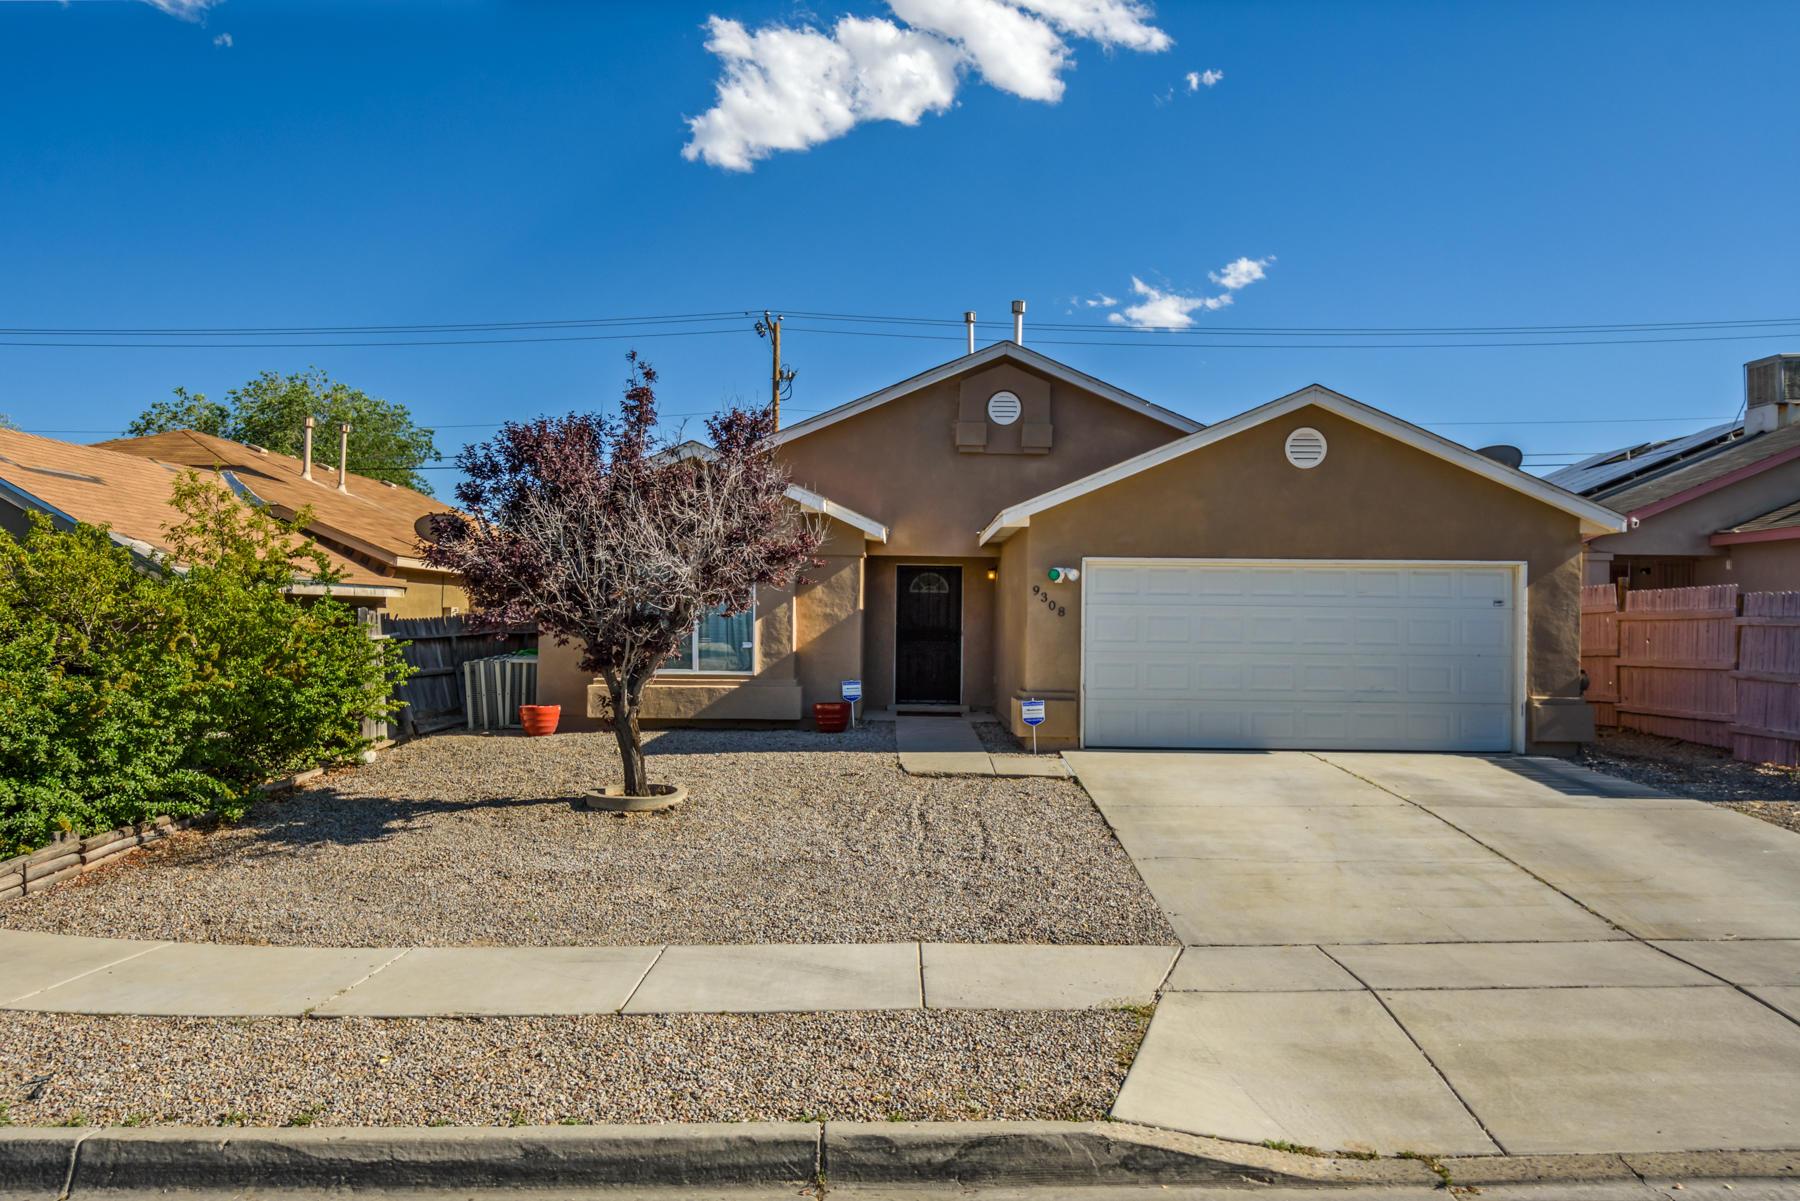 9308 JETTY Court NW, Albuquerque, NM 87121 - Albuquerque, NM real estate listing